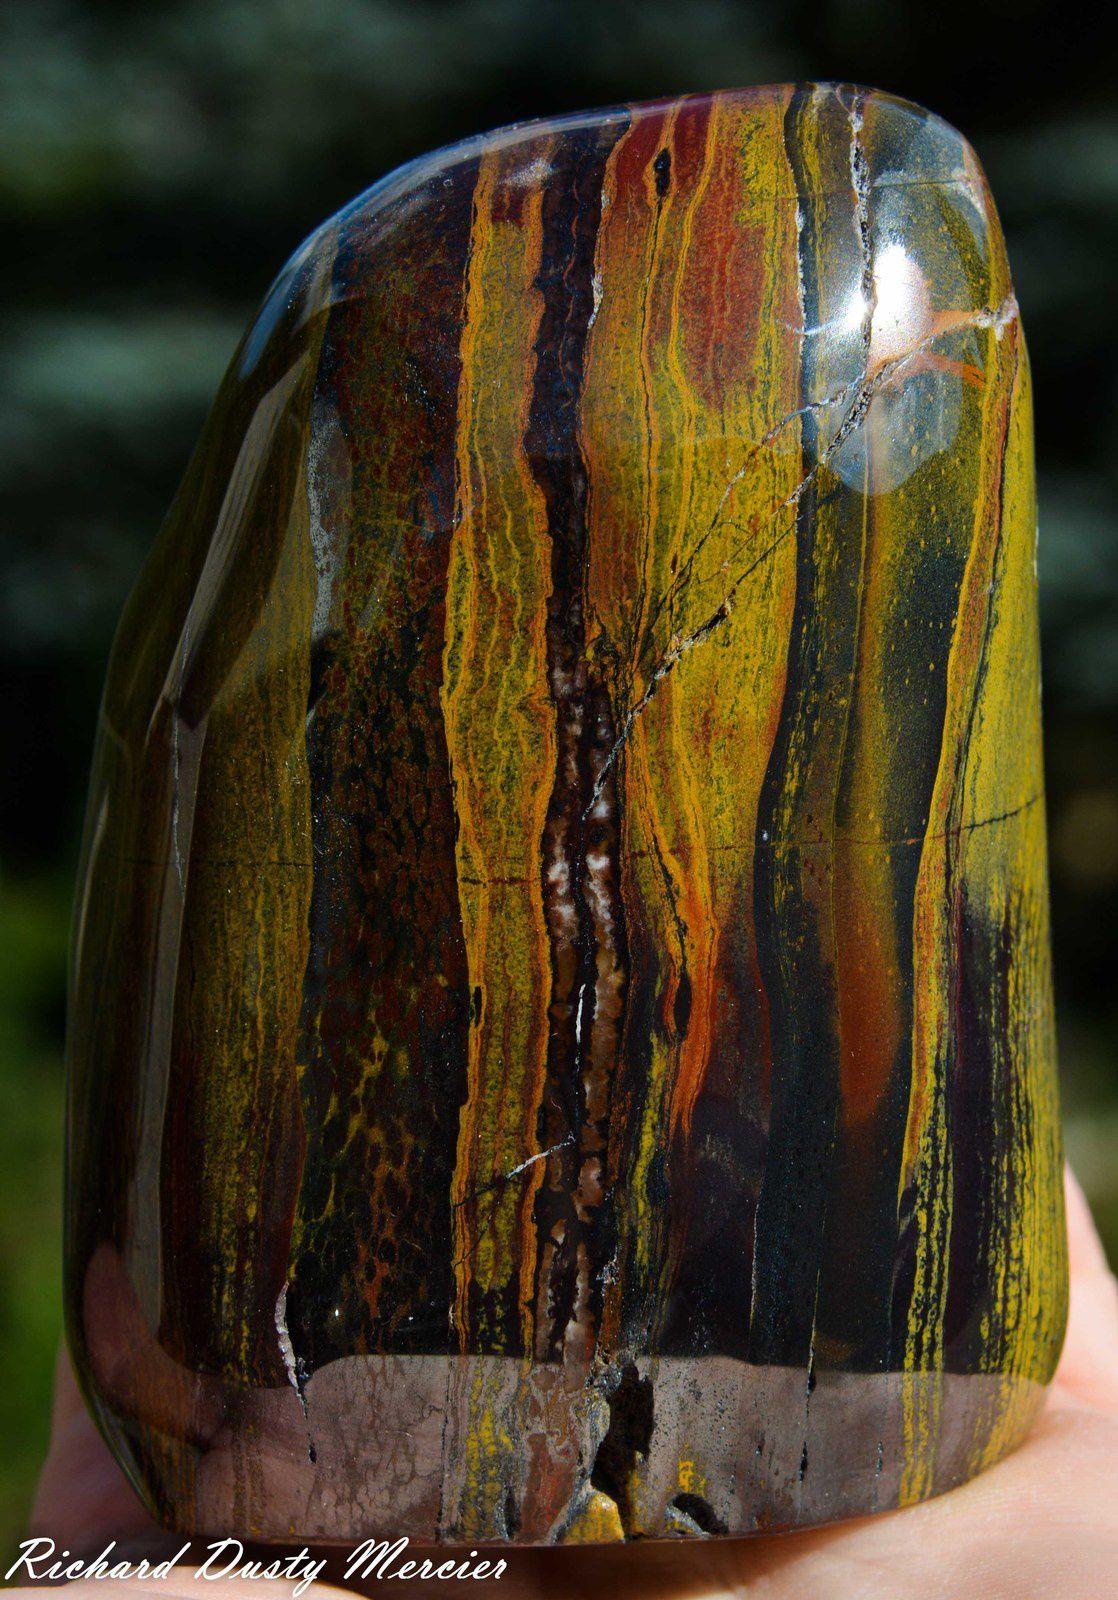 Tiger Eye / Bull Eye / Iron Eye (Oeil de Tigre / Oeil de Taureau / Oeil de Fer) from Madagascar (size: Cabinet)